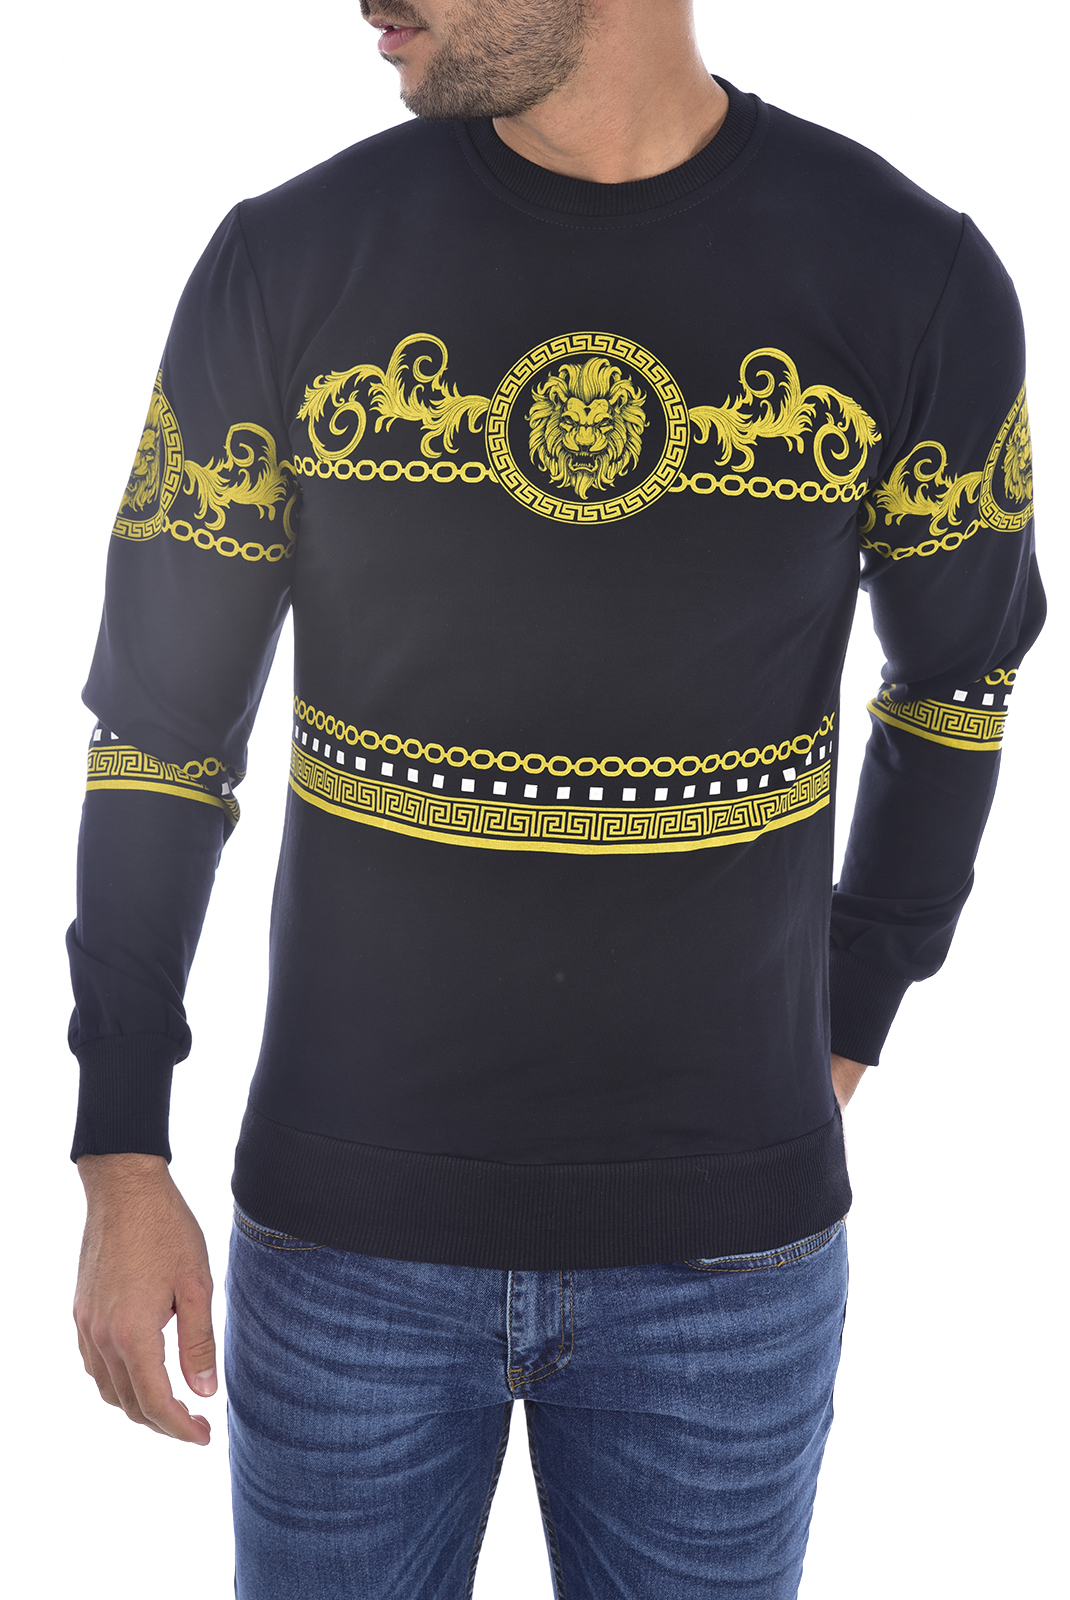 Sweatshirts  Goldenim paris 1236 NOIR